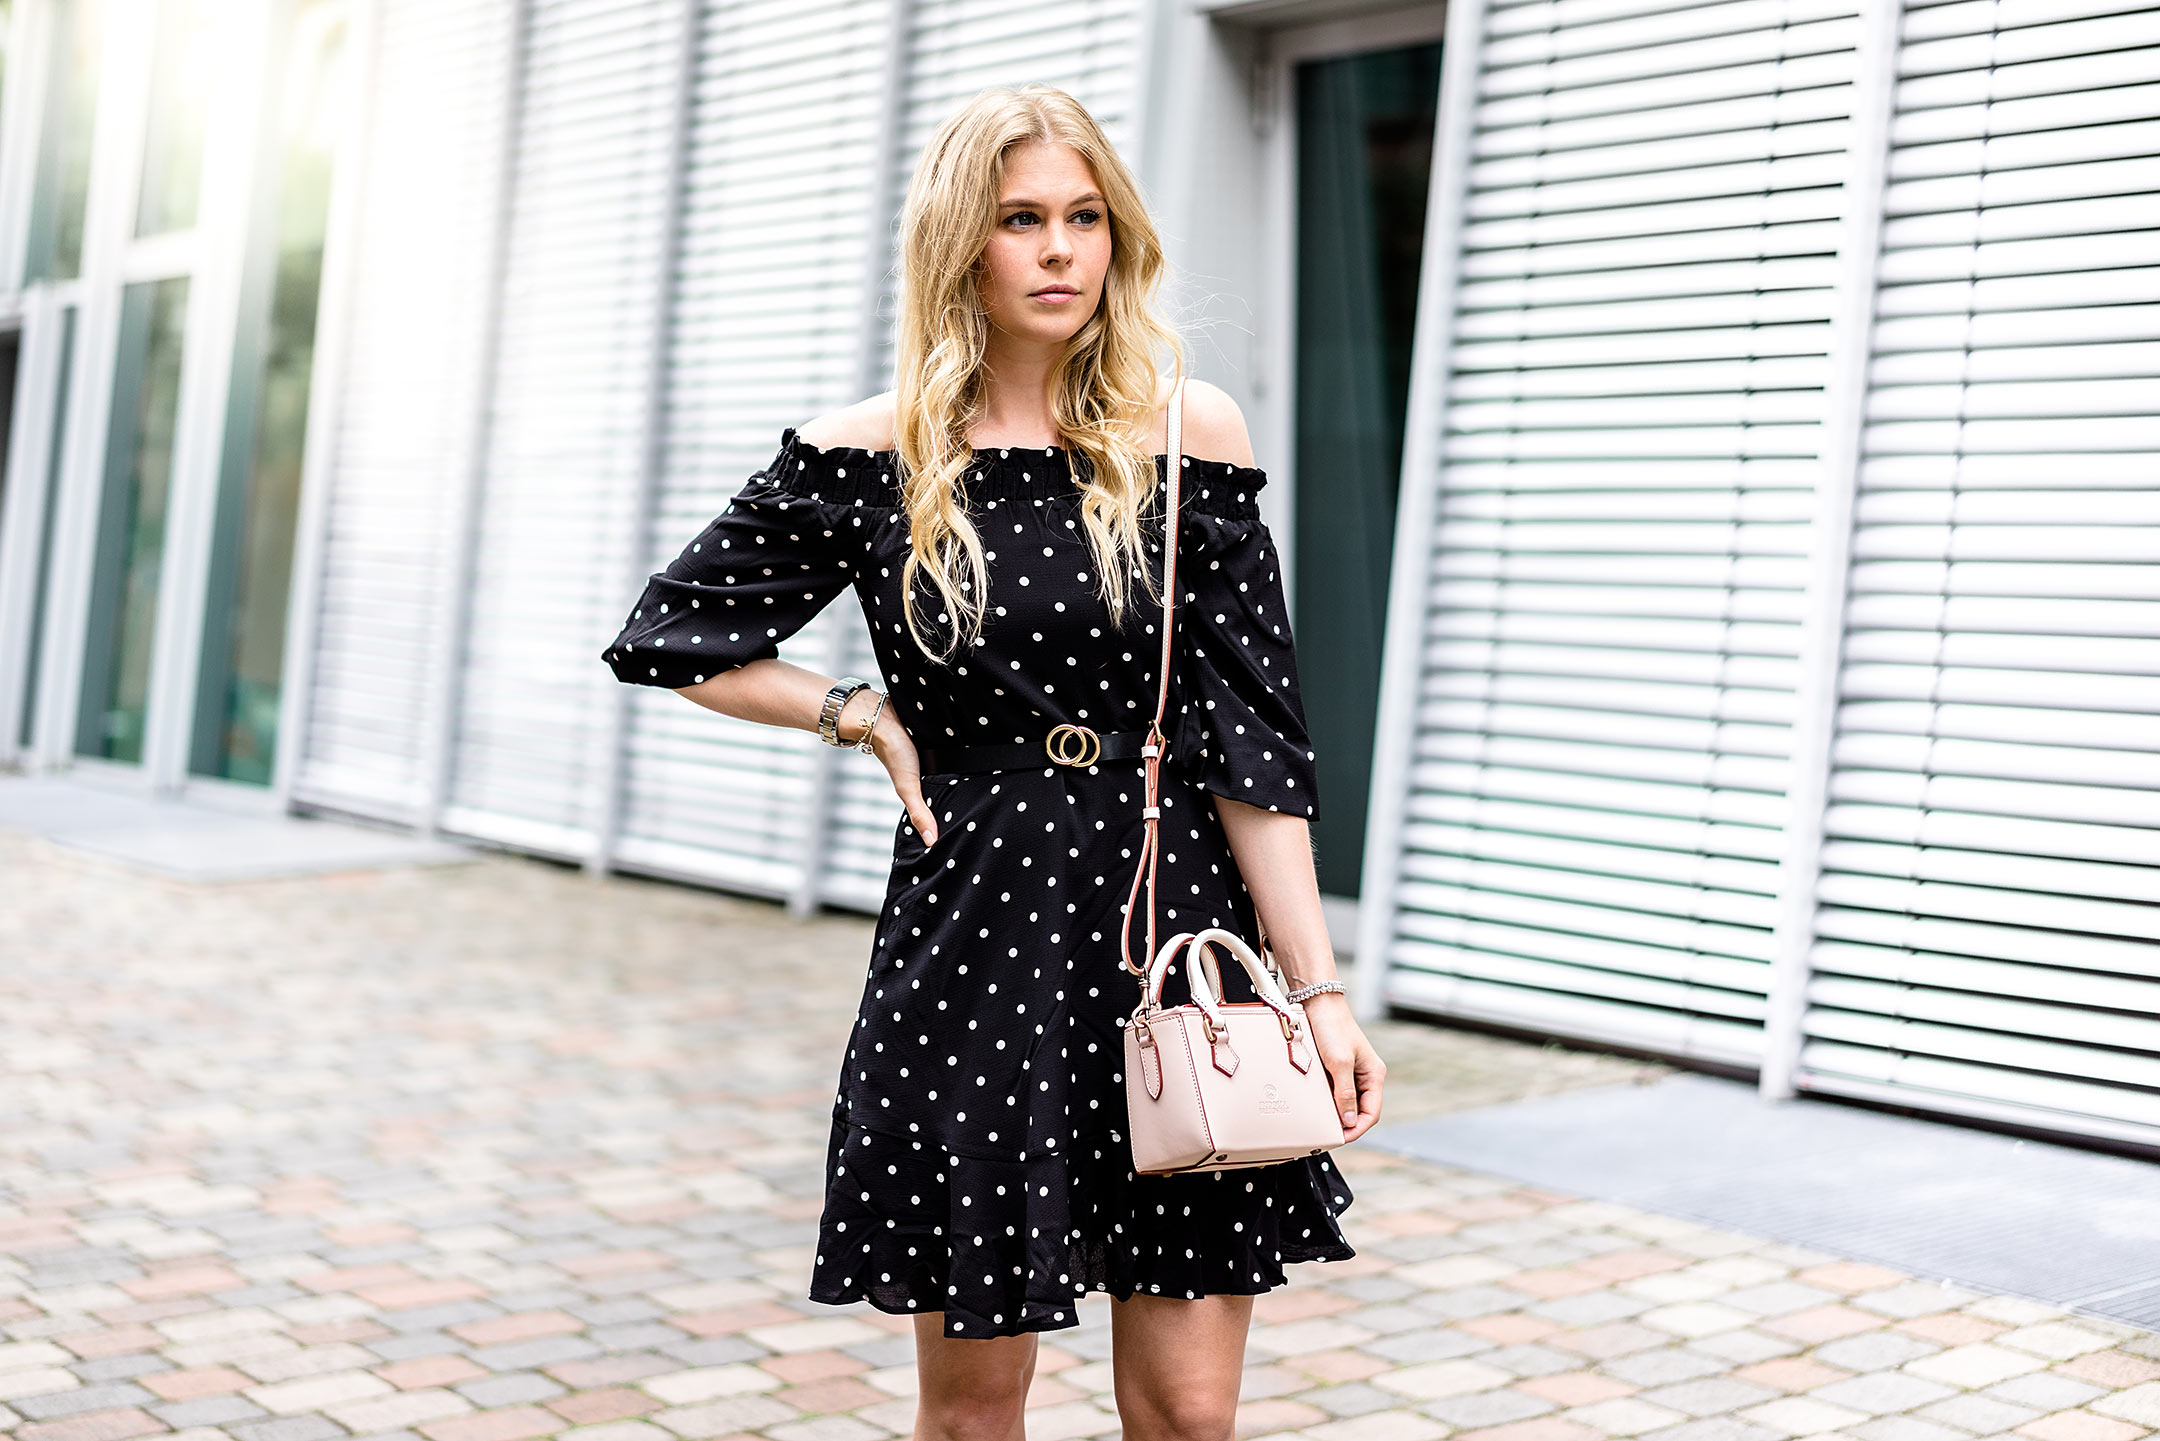 kleid mit polka dots - sunnyinga - lifestyle & fashion blog